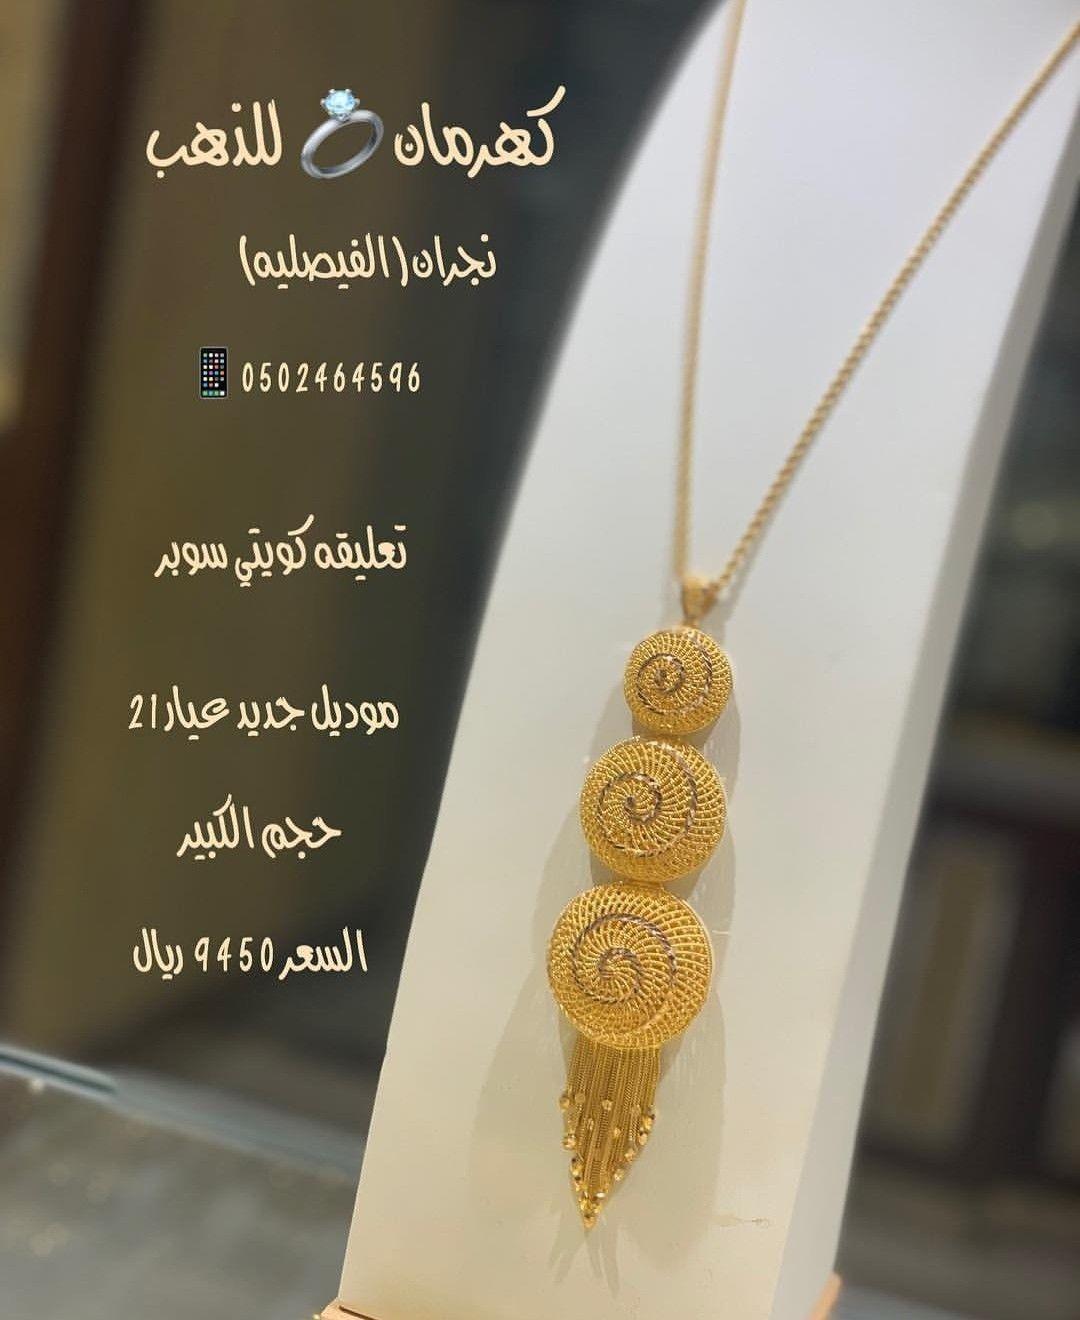 Pin By Shyma On Gold الذھب Bridal Gold Jewellery Bridal Gold Jewellery Designs Gold Chain Design